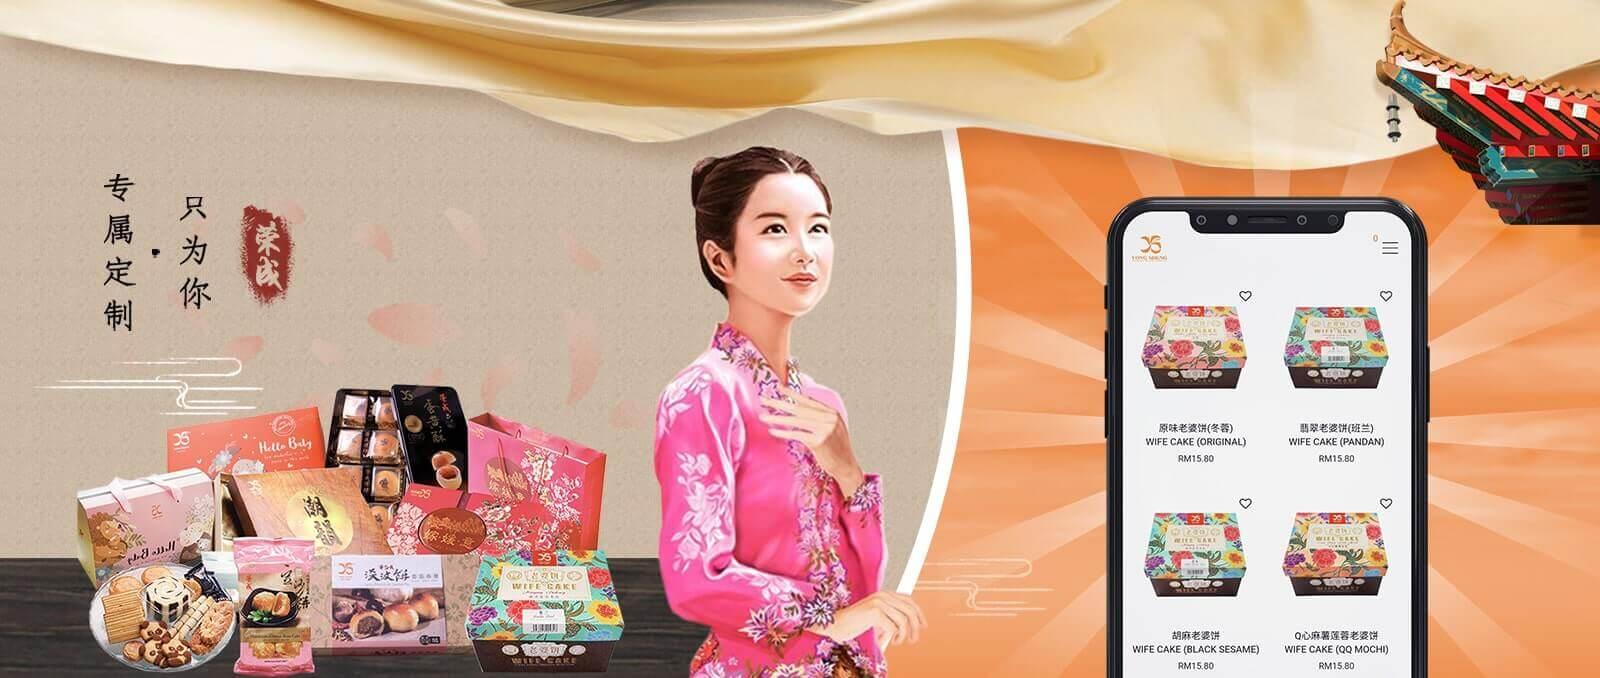 Yong Sheng App Banner